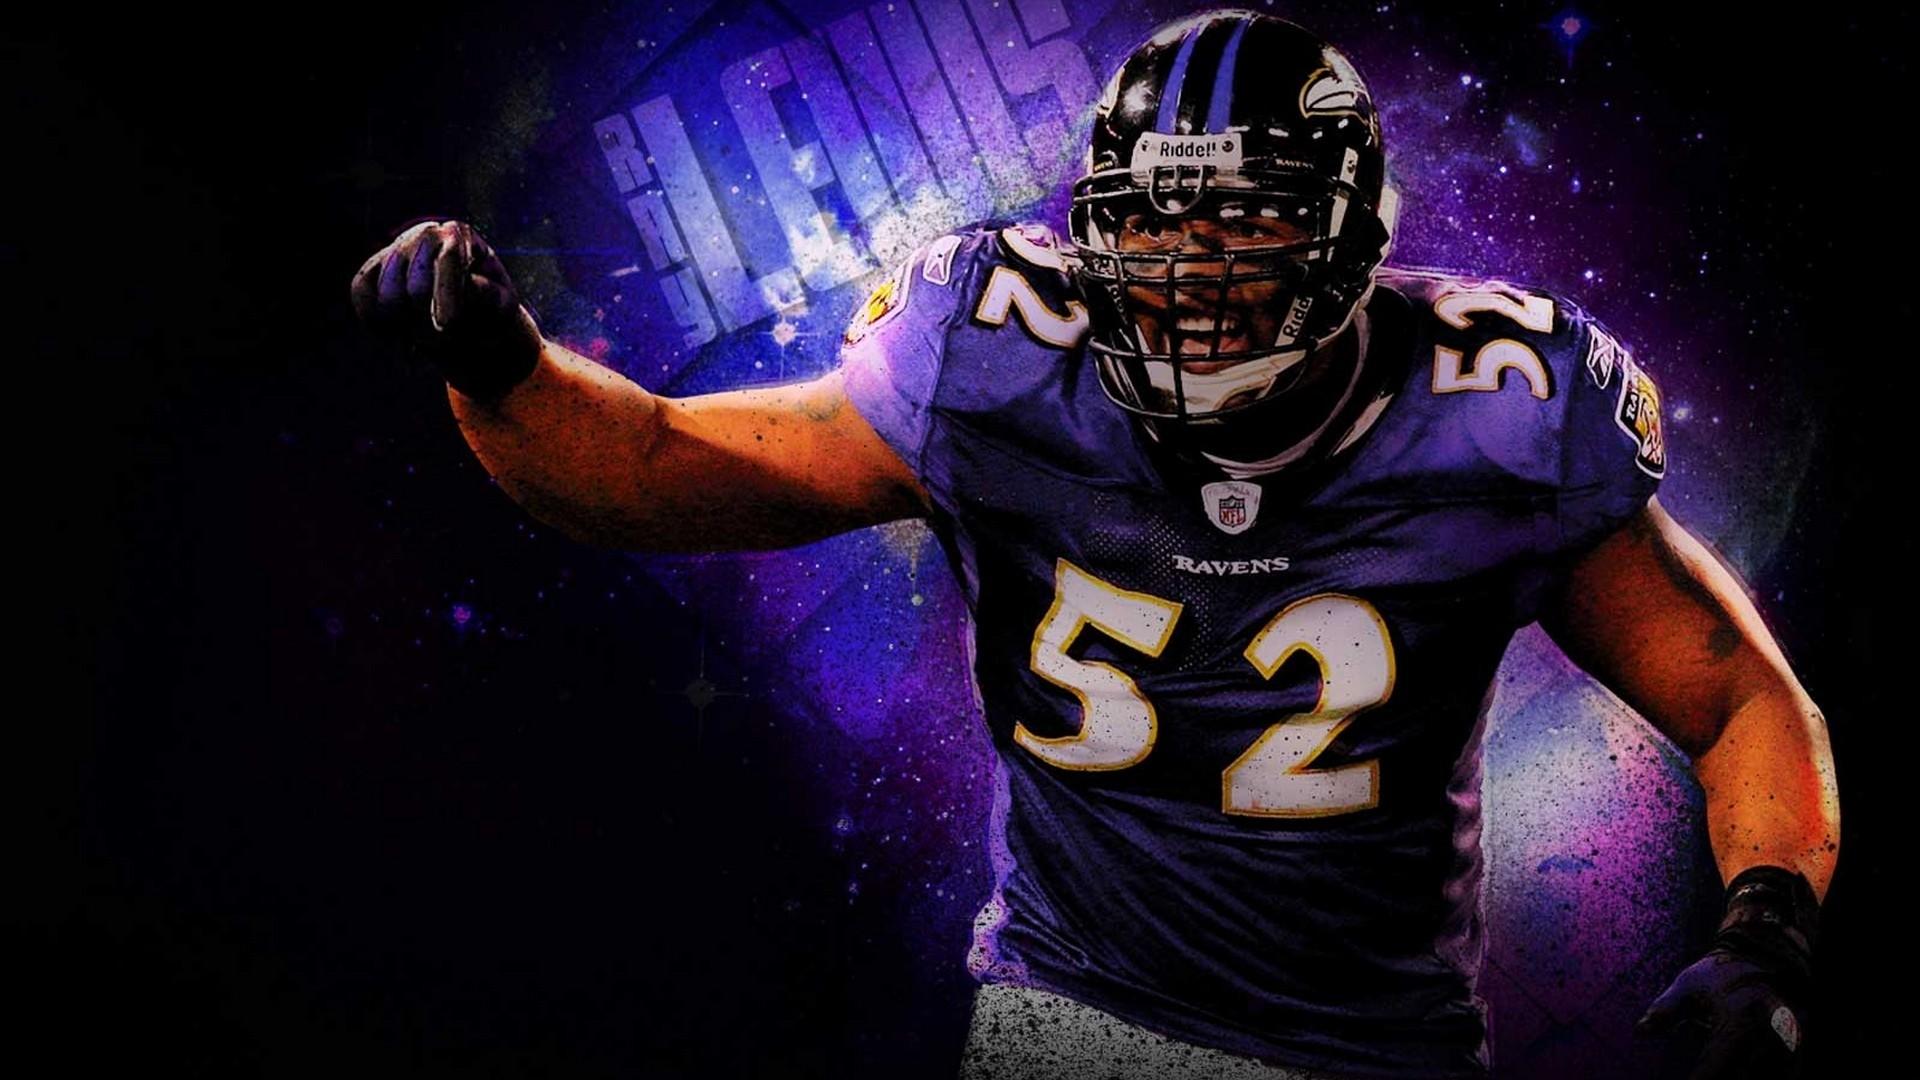 Baltimore Ravens High Quality